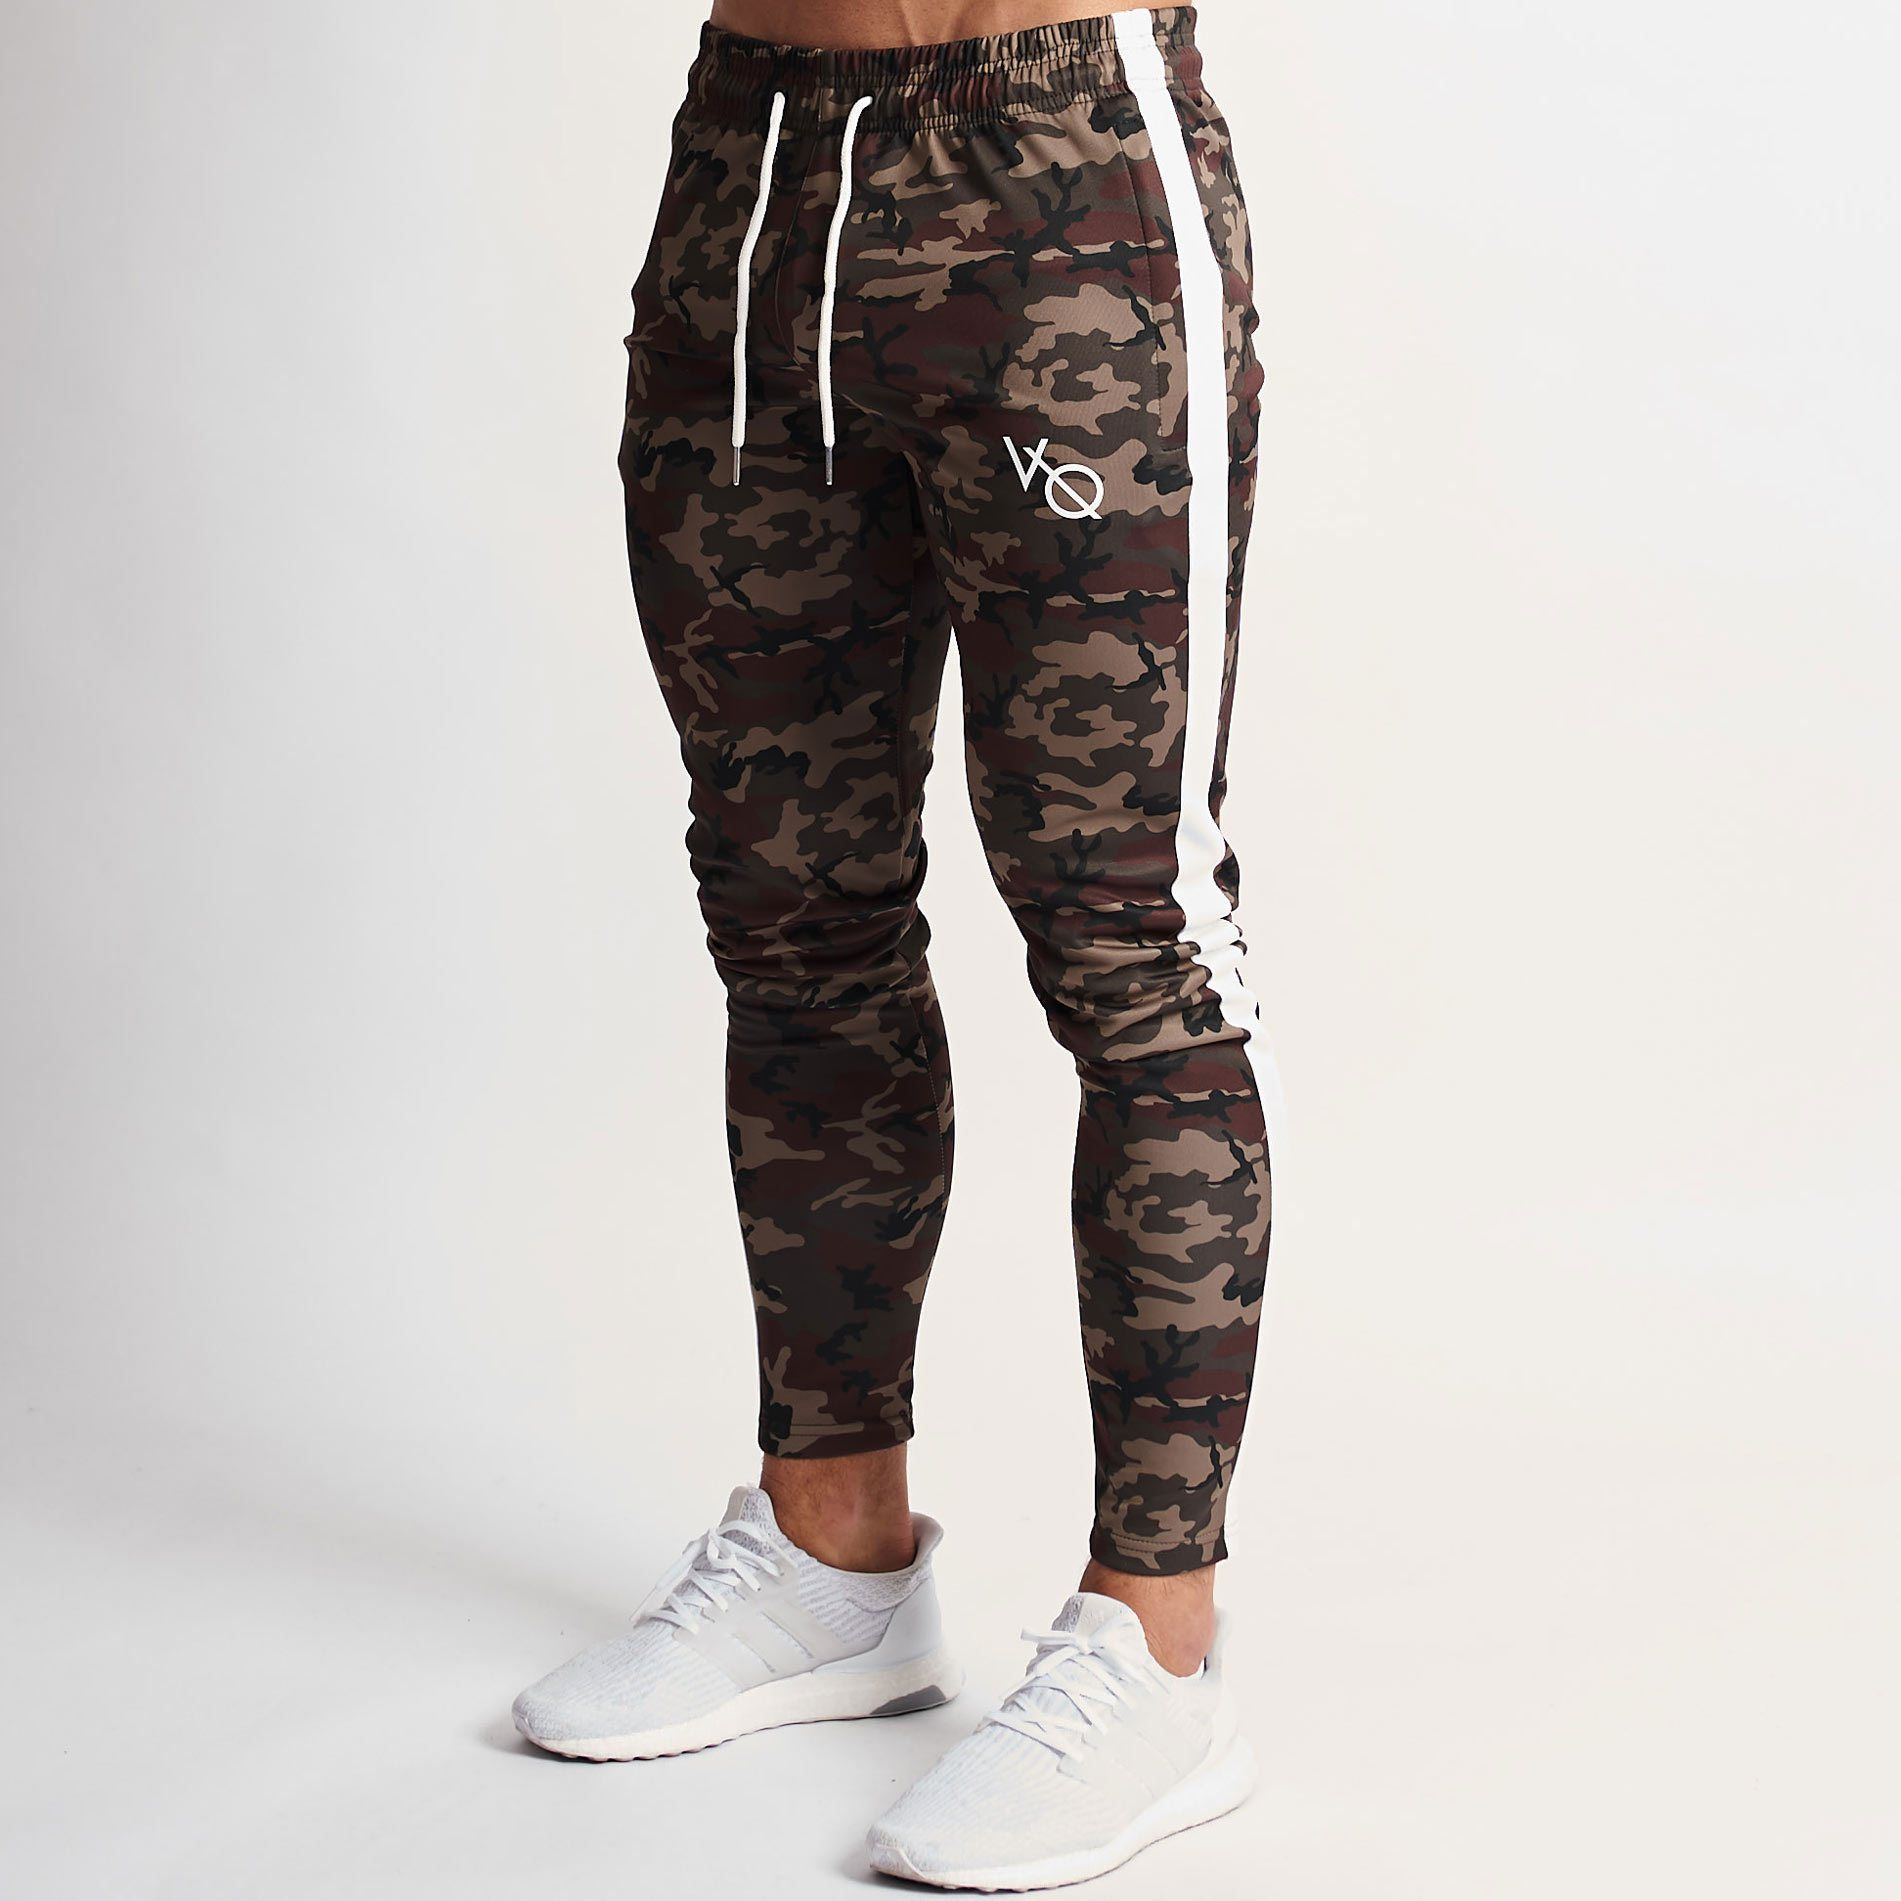 395d00bae2812 Venom Compression Leggings. Skinny Sweatpants For Men Compression Pants ...